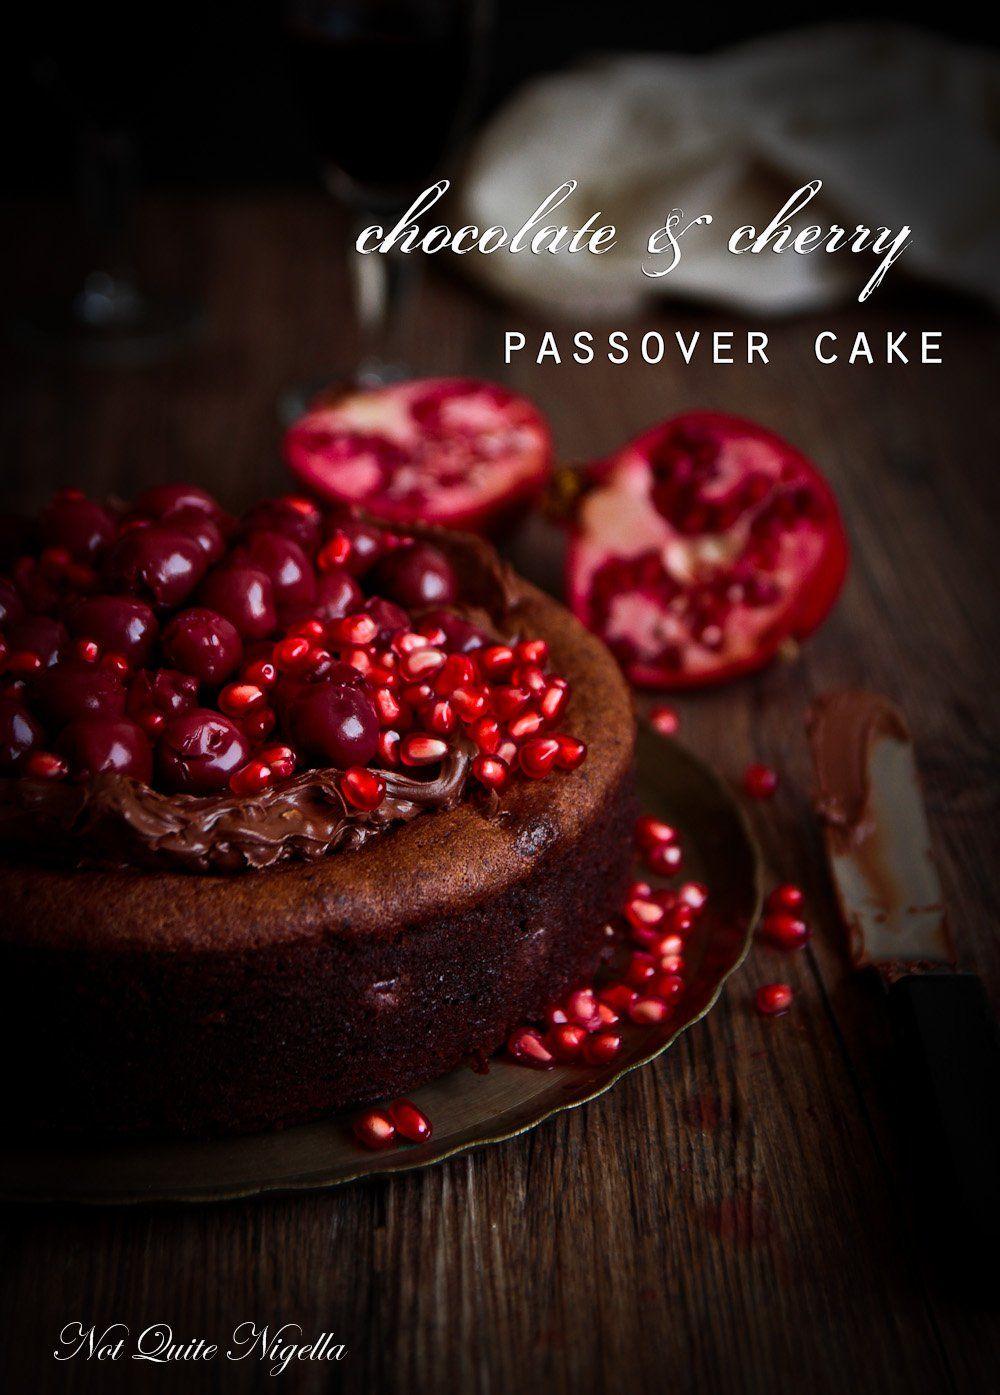 Flourless Chocolate Cherry Cake for Passover (Gluten Free